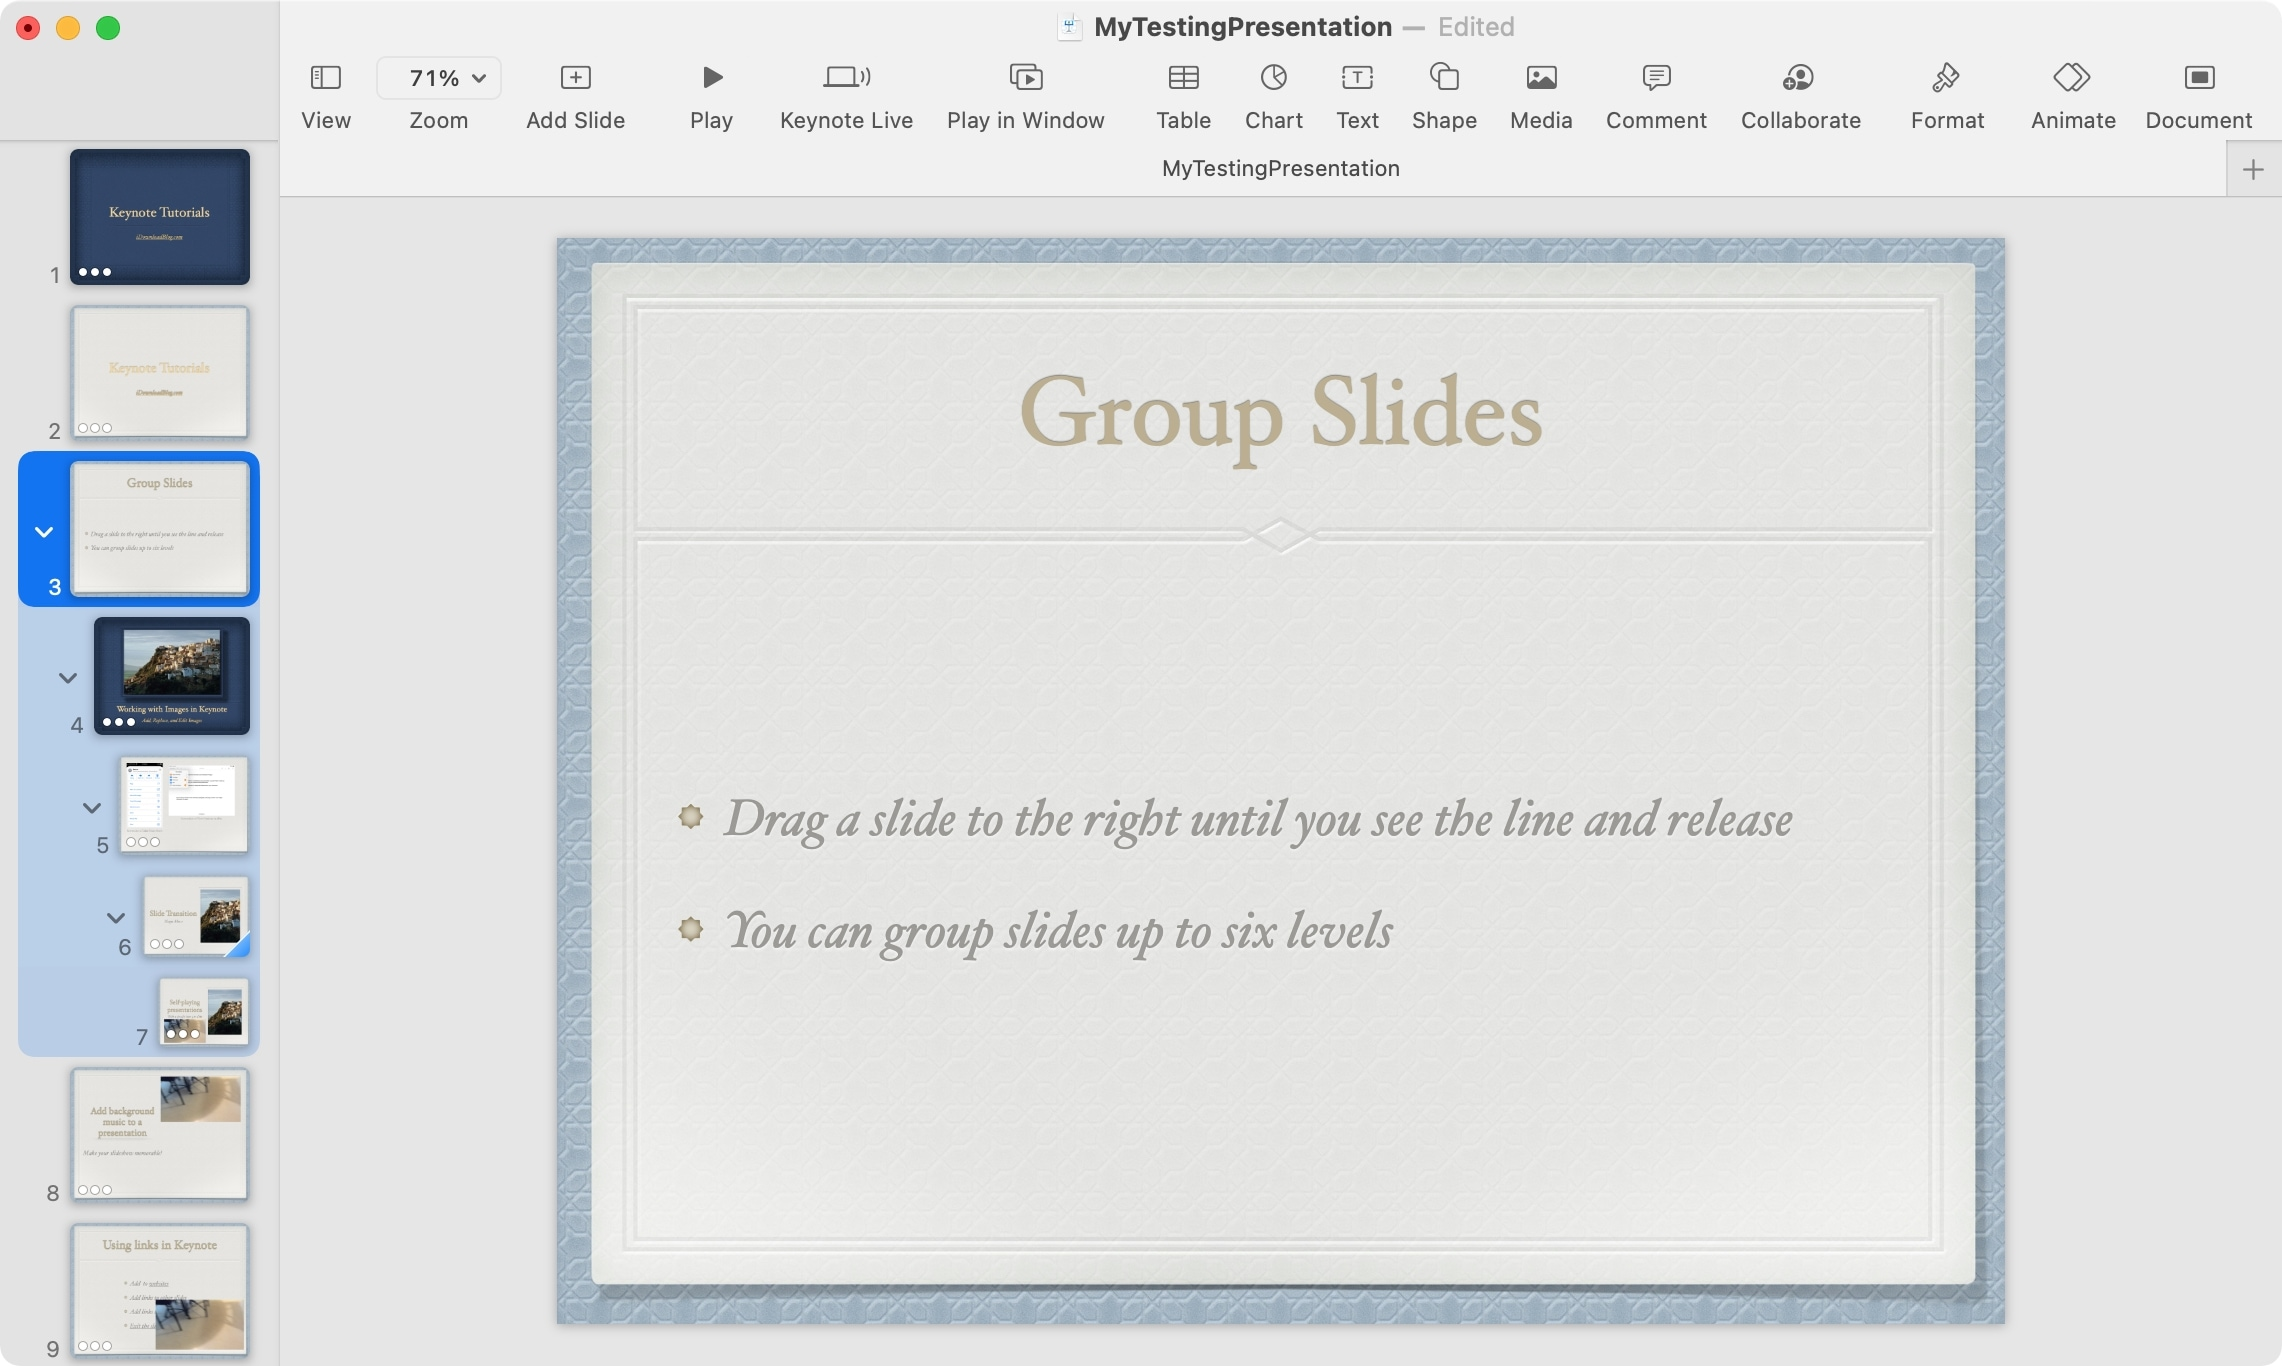 Grouped Slides in Keynote on Mac